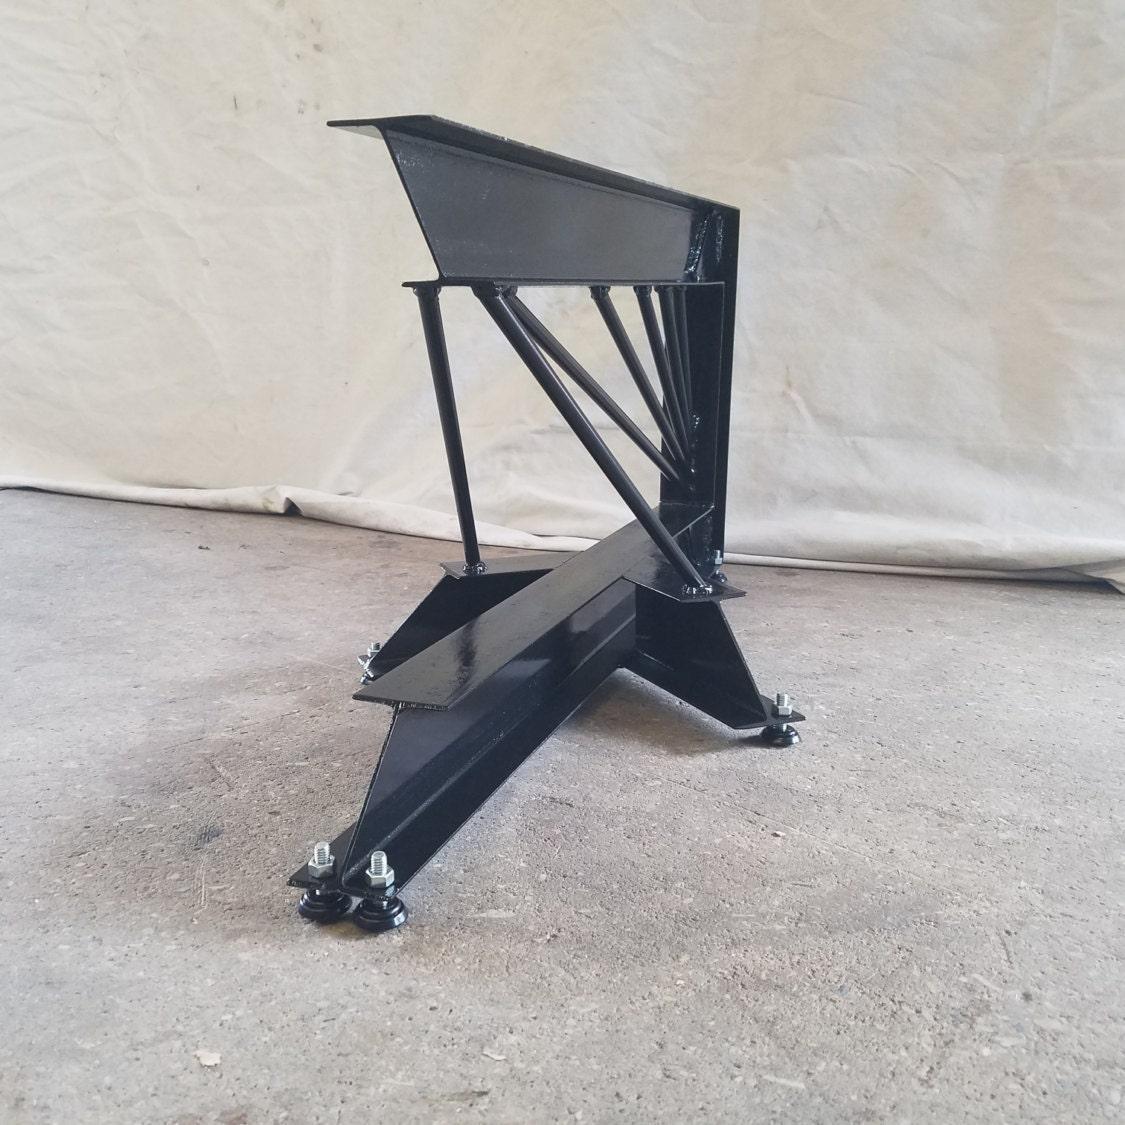 Steel Coffee Table Legs Australia: Cantilevered Steel I-Beam Table Legs. Industrial Modern